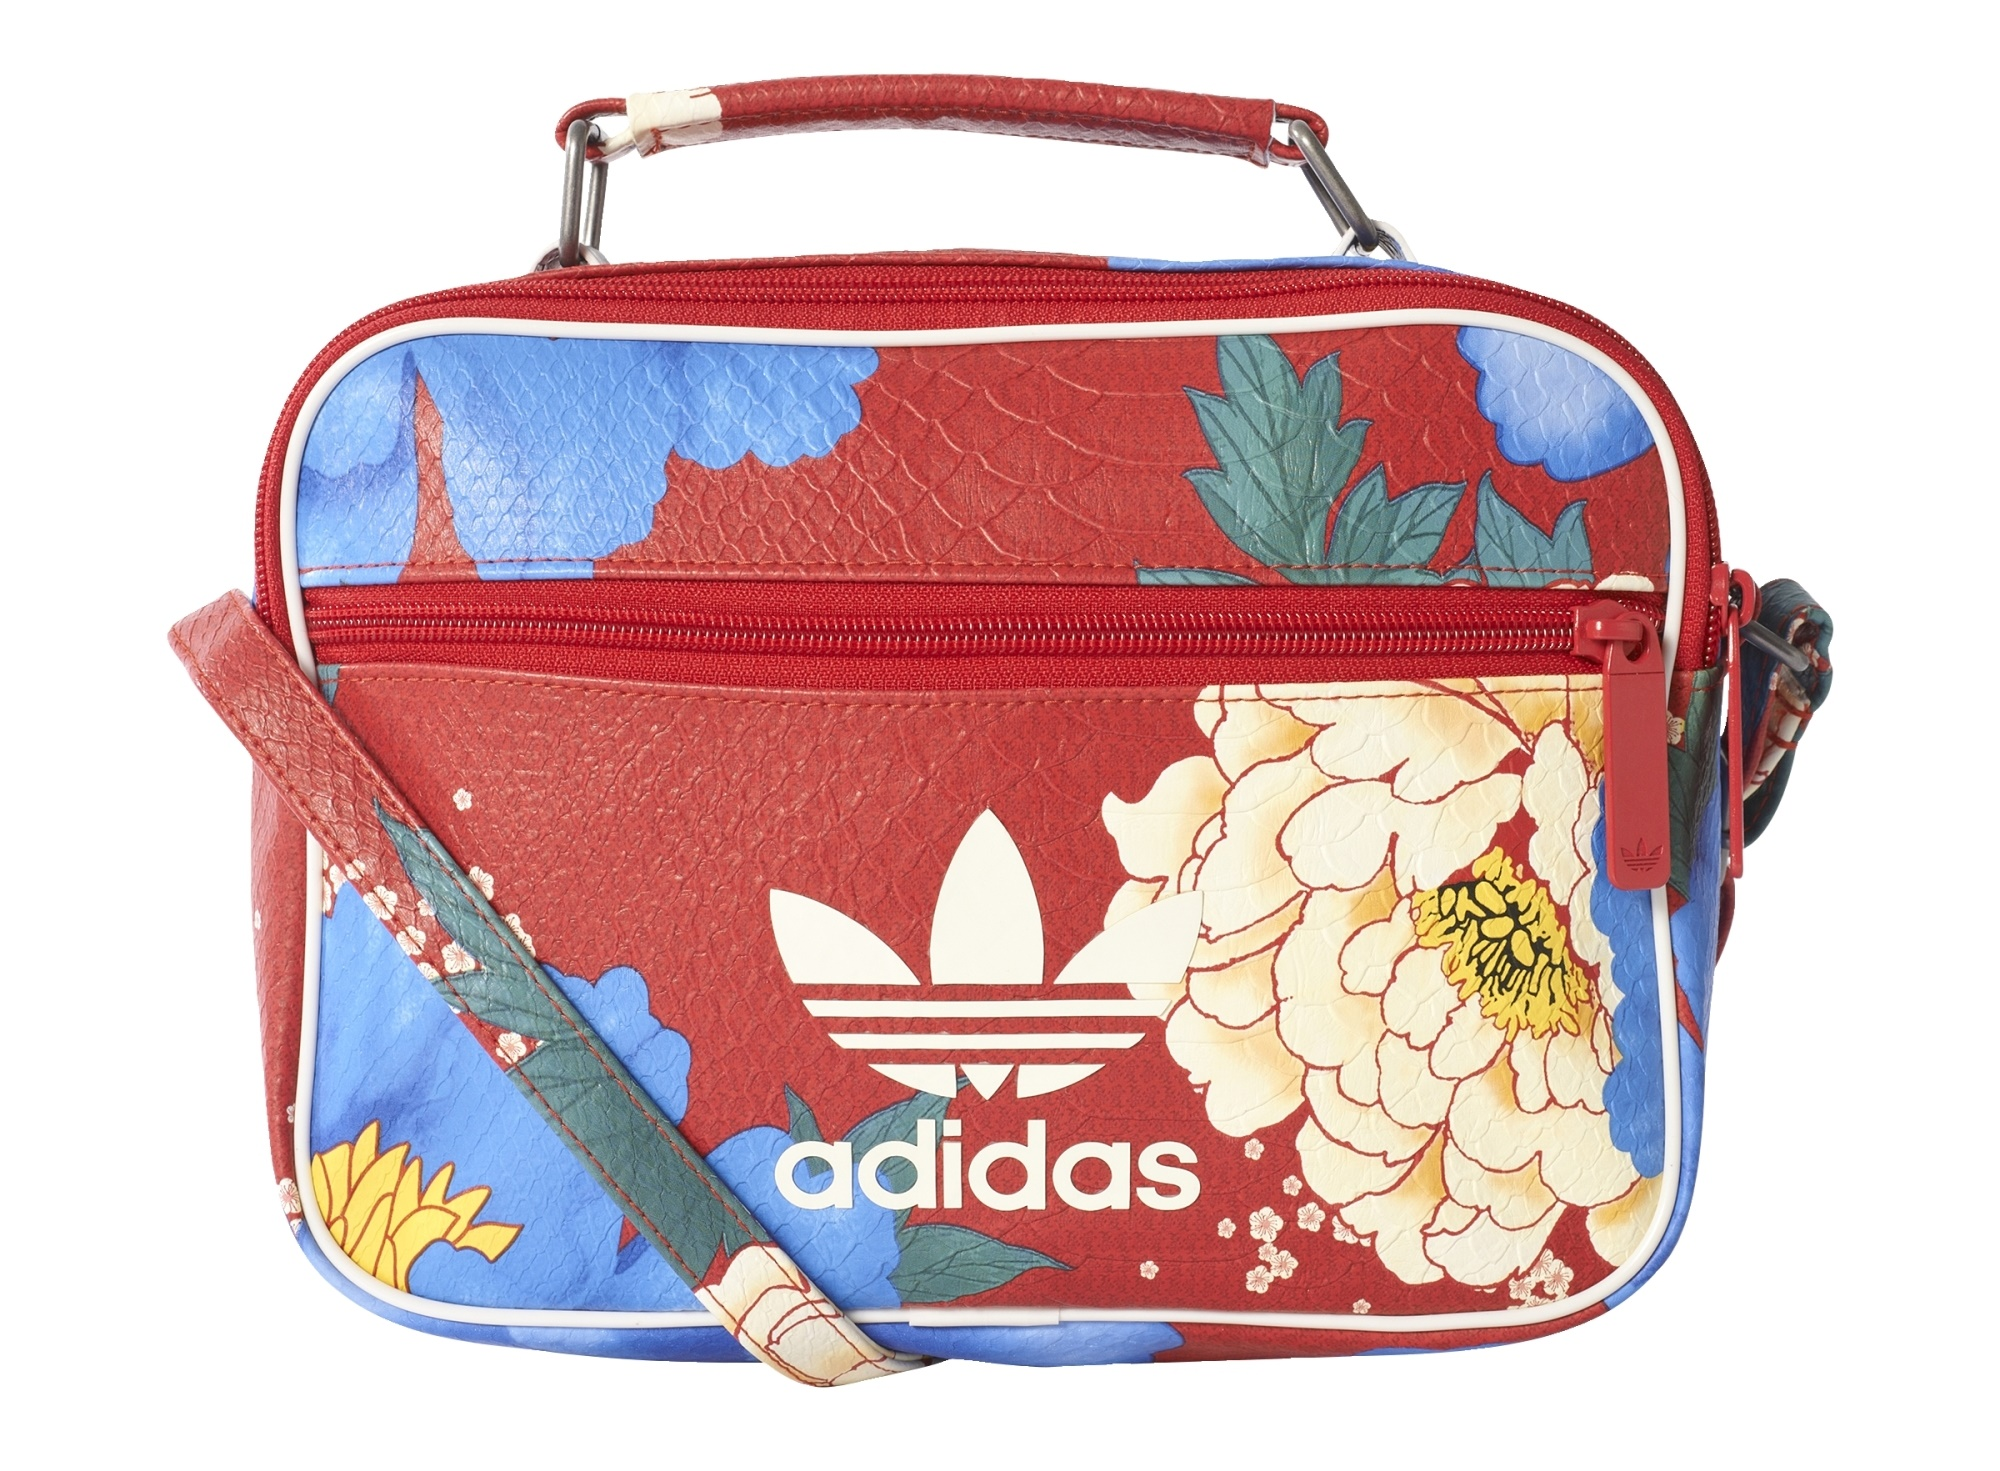 Adidas Originals Airliner Mini Bag AOP